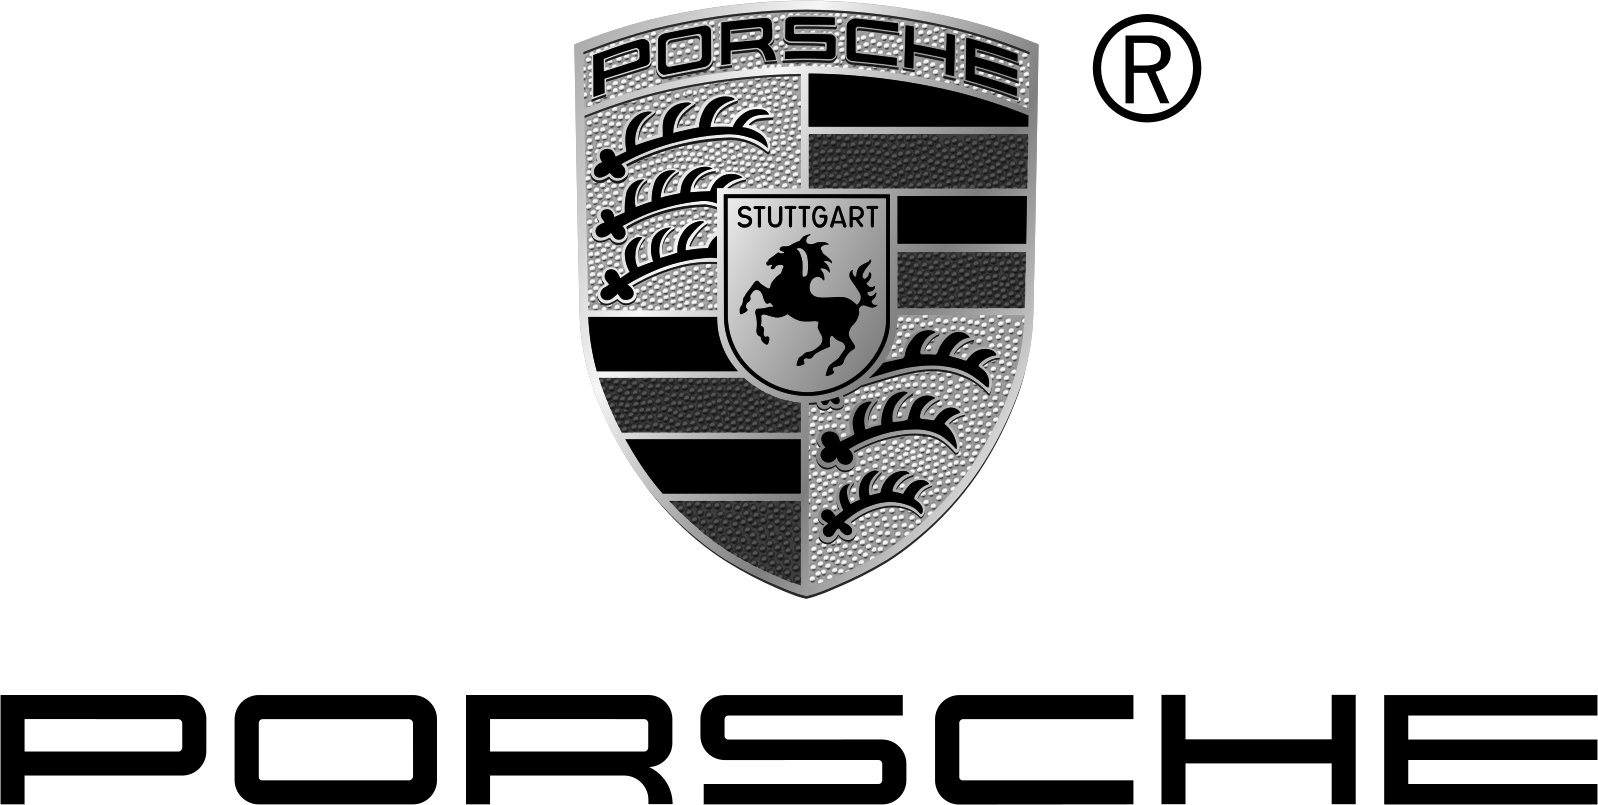 A_001_Porsche_schwarz_weiss